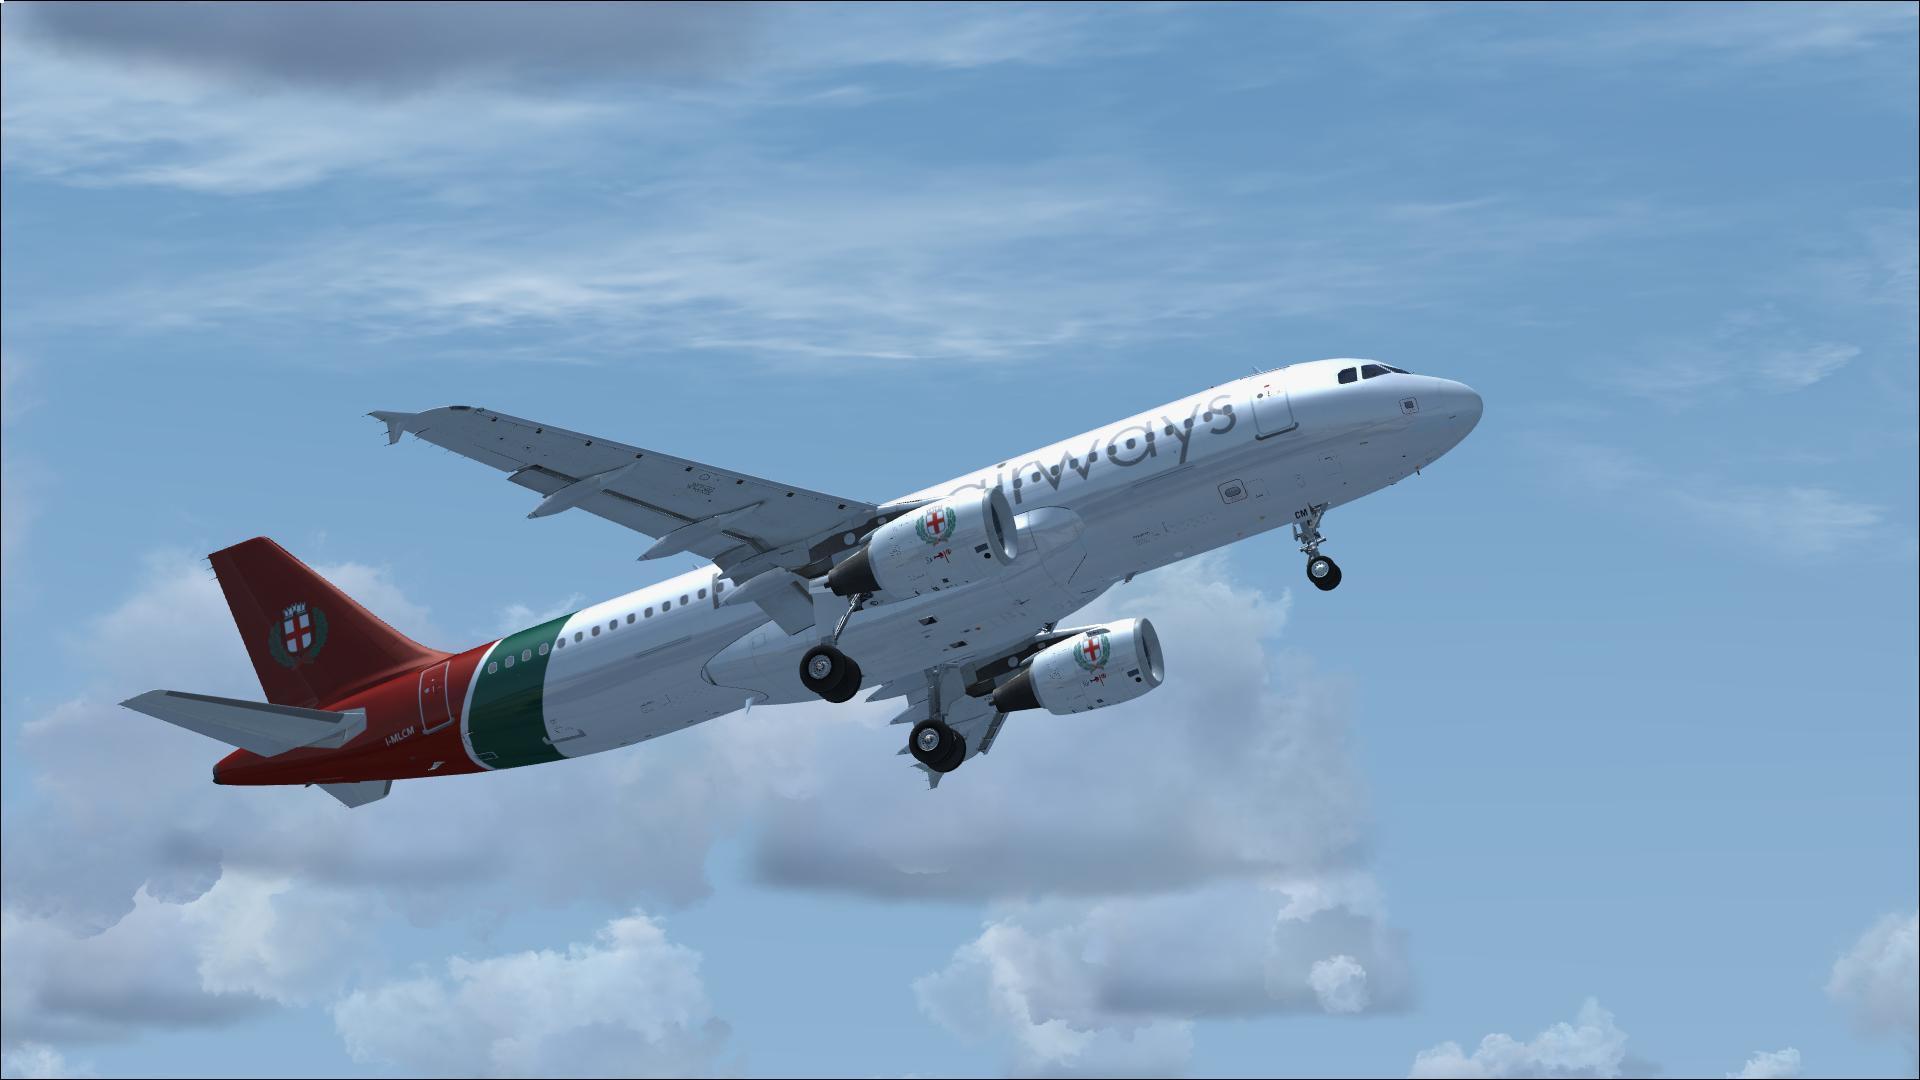 Livrea Milan Airways Virtual Airbus A320 Flight Sim Labs 5942bfe485d11_fsx2017-06-1518-12-51-21.jpg.2d33c8c4a62c833a71bffd80537a1d82